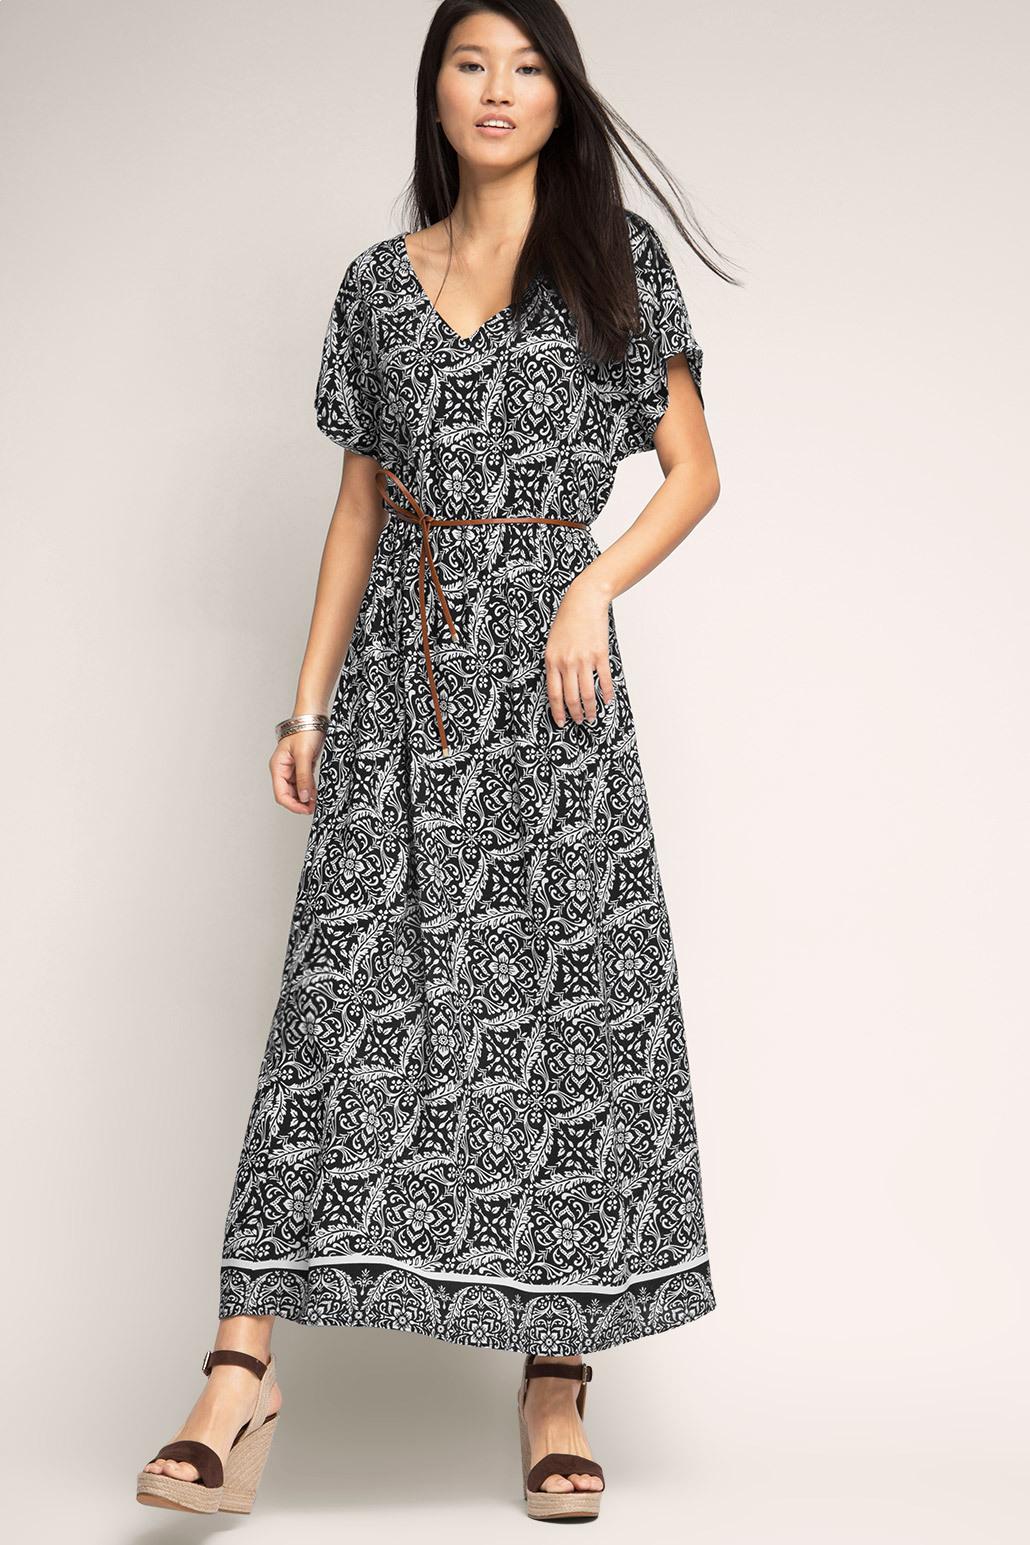 Esprit  Summery Maxi Dress At Our Online Shop